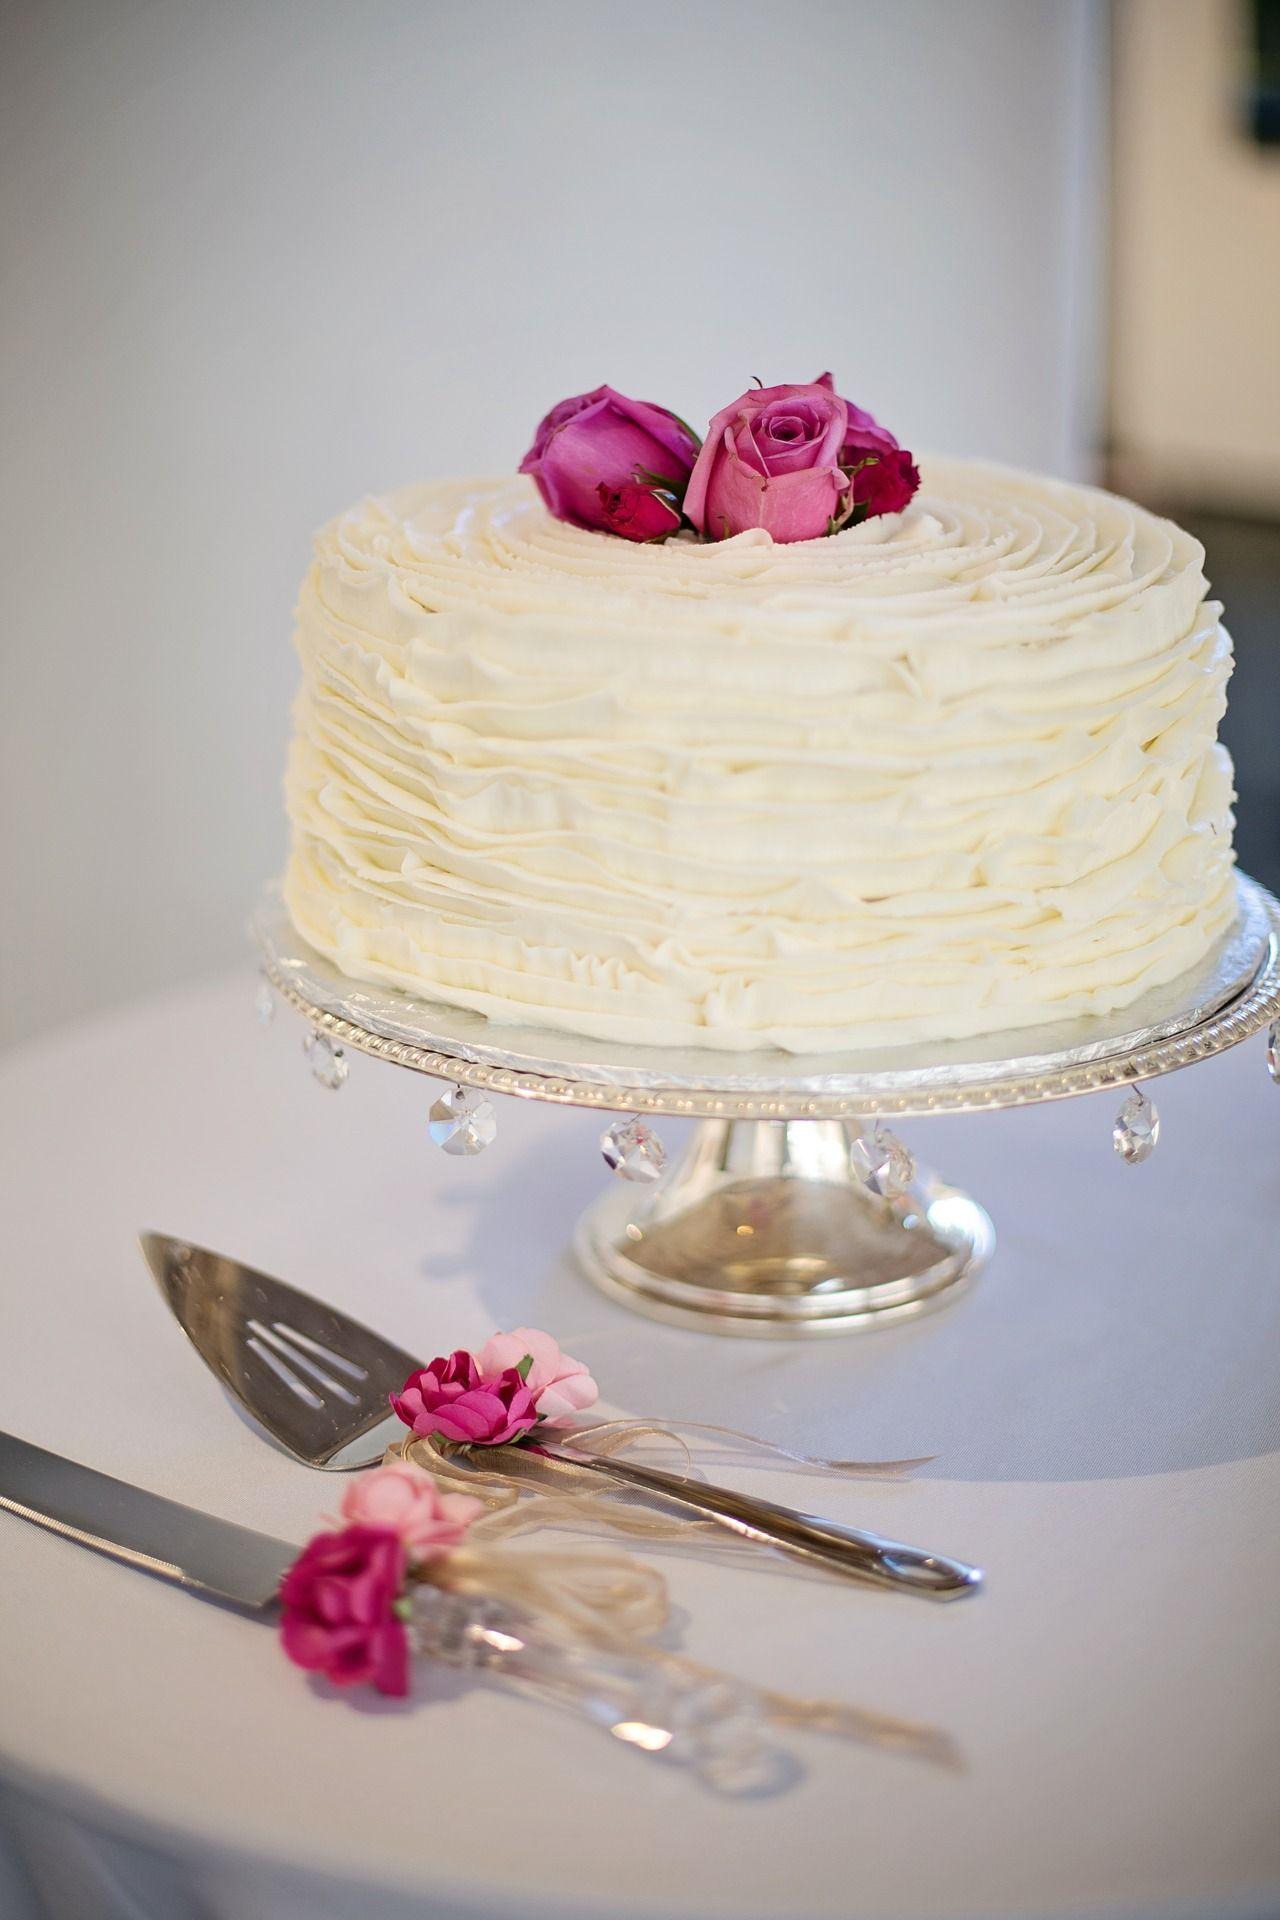 Simple white wedding cake!! #amour #weddings #events #weddingproposal #weddingplanner #santorini #london #weddingcake #white #pink #bride #groom #celebrate #weddingdestination